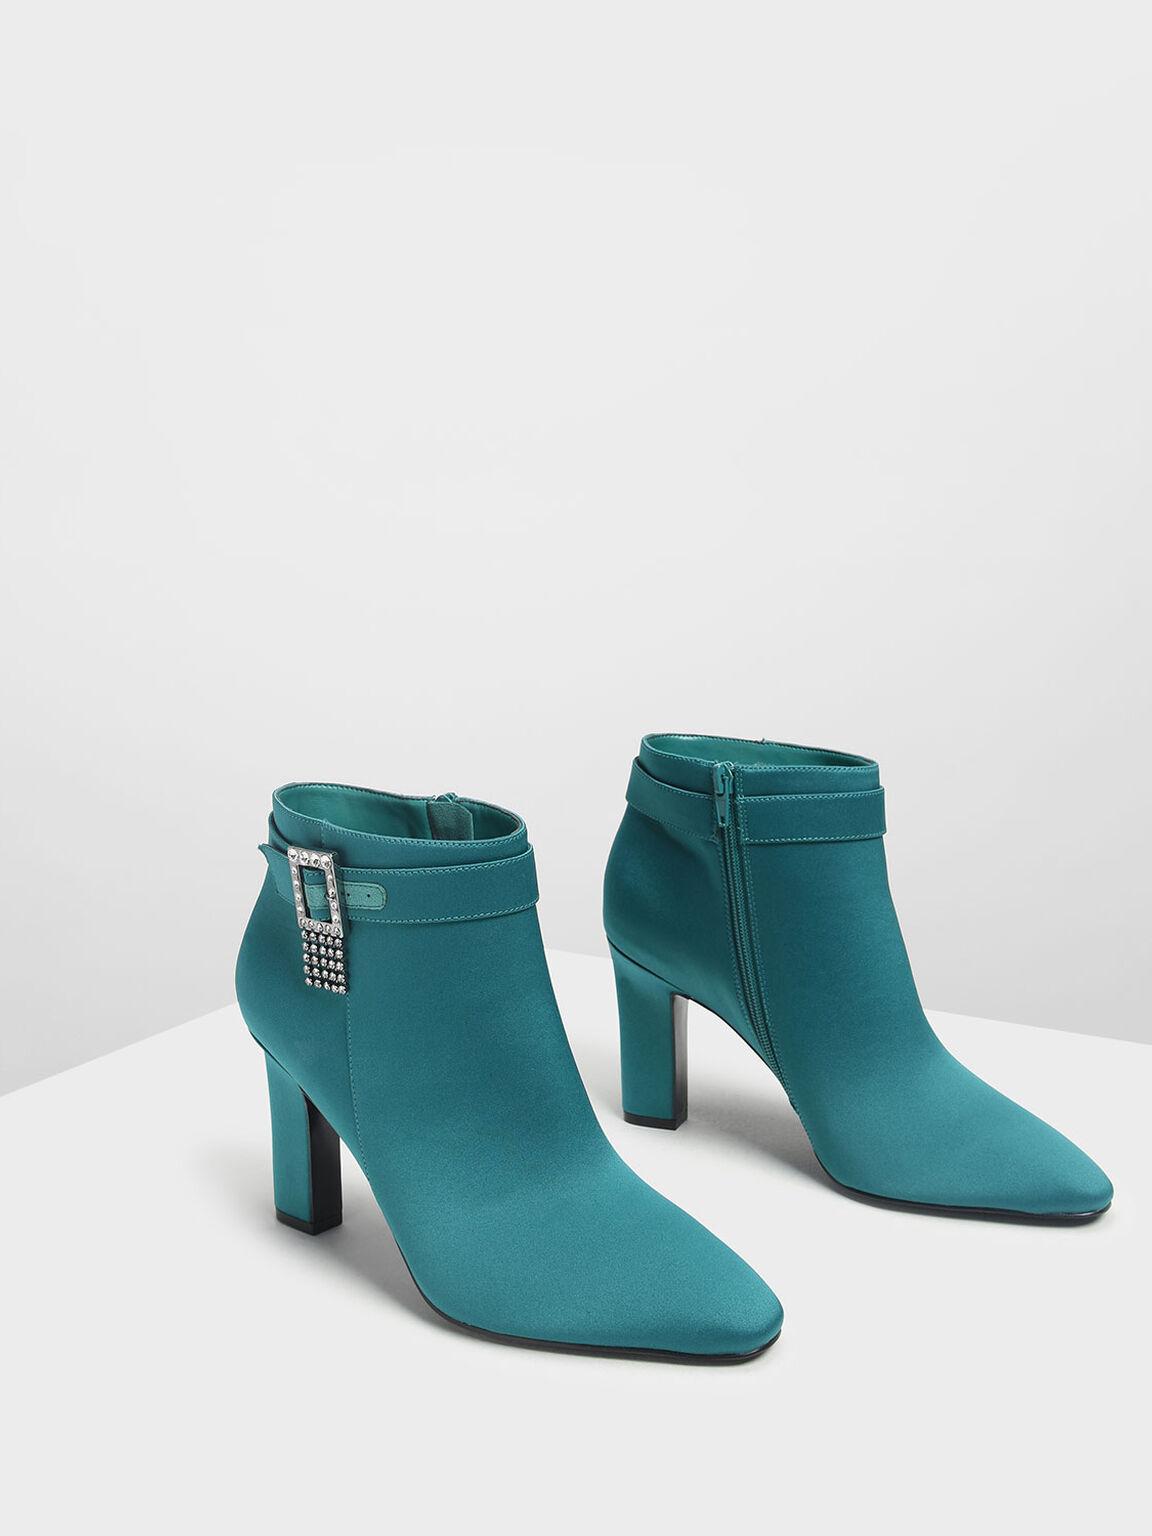 Embellished Buckle Ankle Boots, Green, hi-res